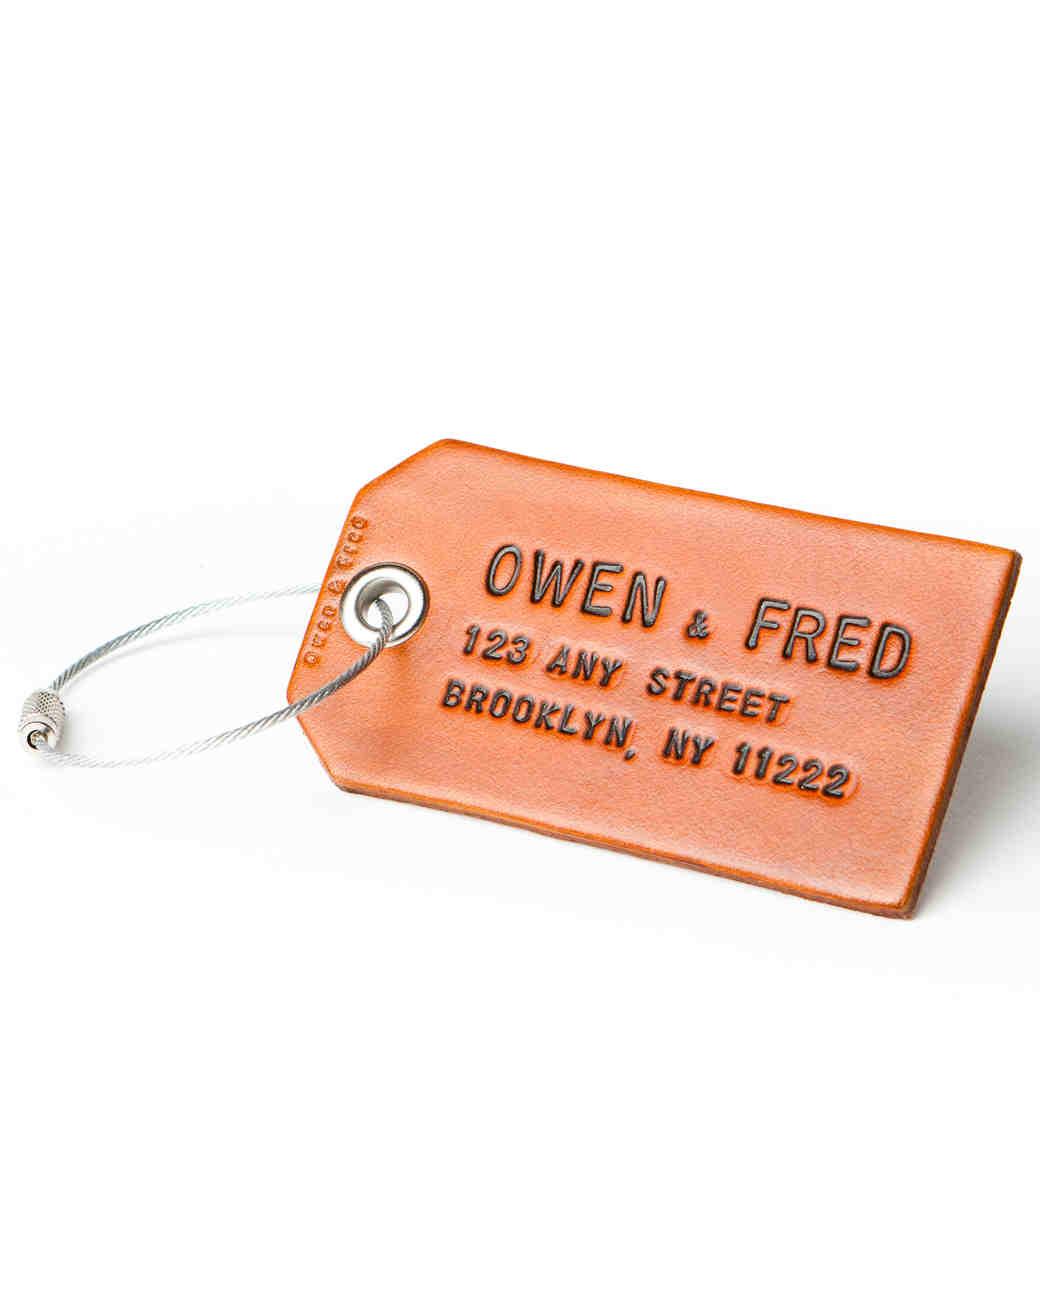 groomsmen-gift-ideas-owen-fred-luggage-tags-0614.jpg